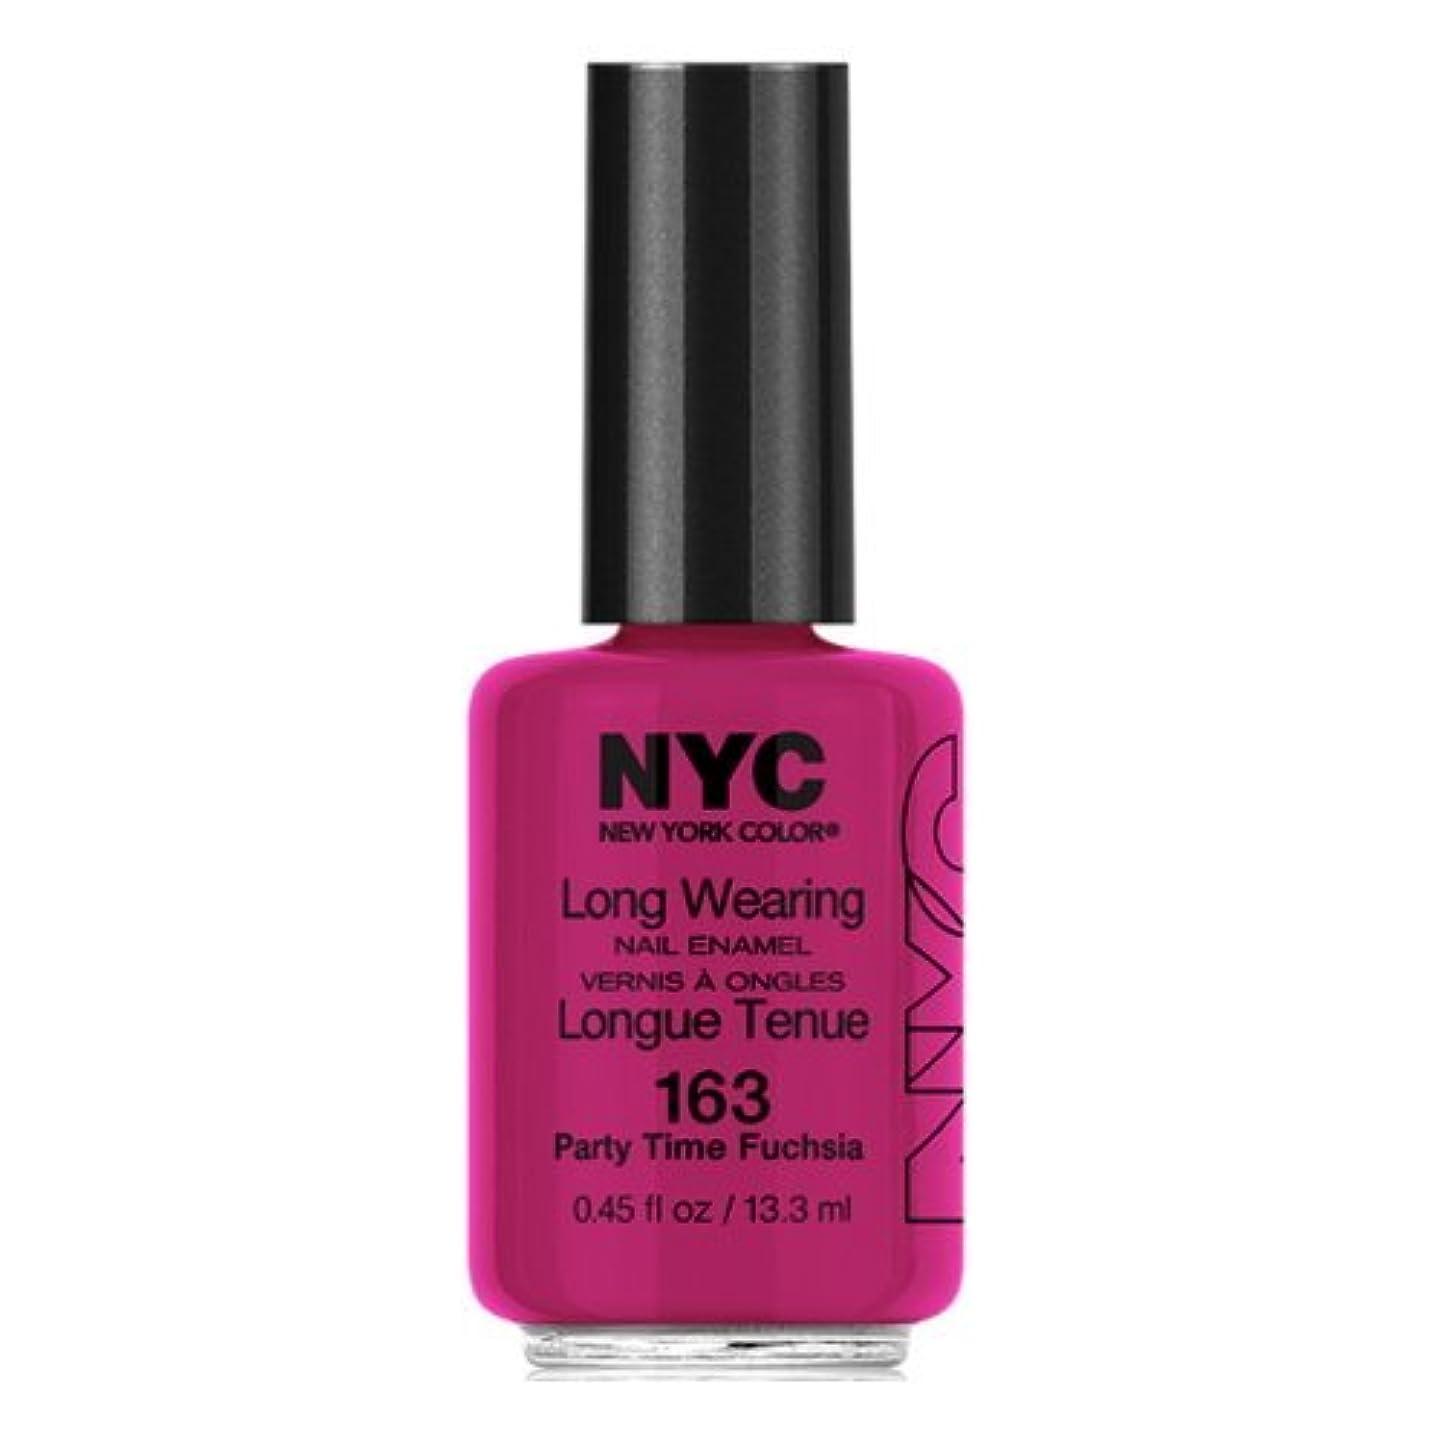 NYC Long Wearing Nail Enamel Party Time Fuschia (並行輸入品)